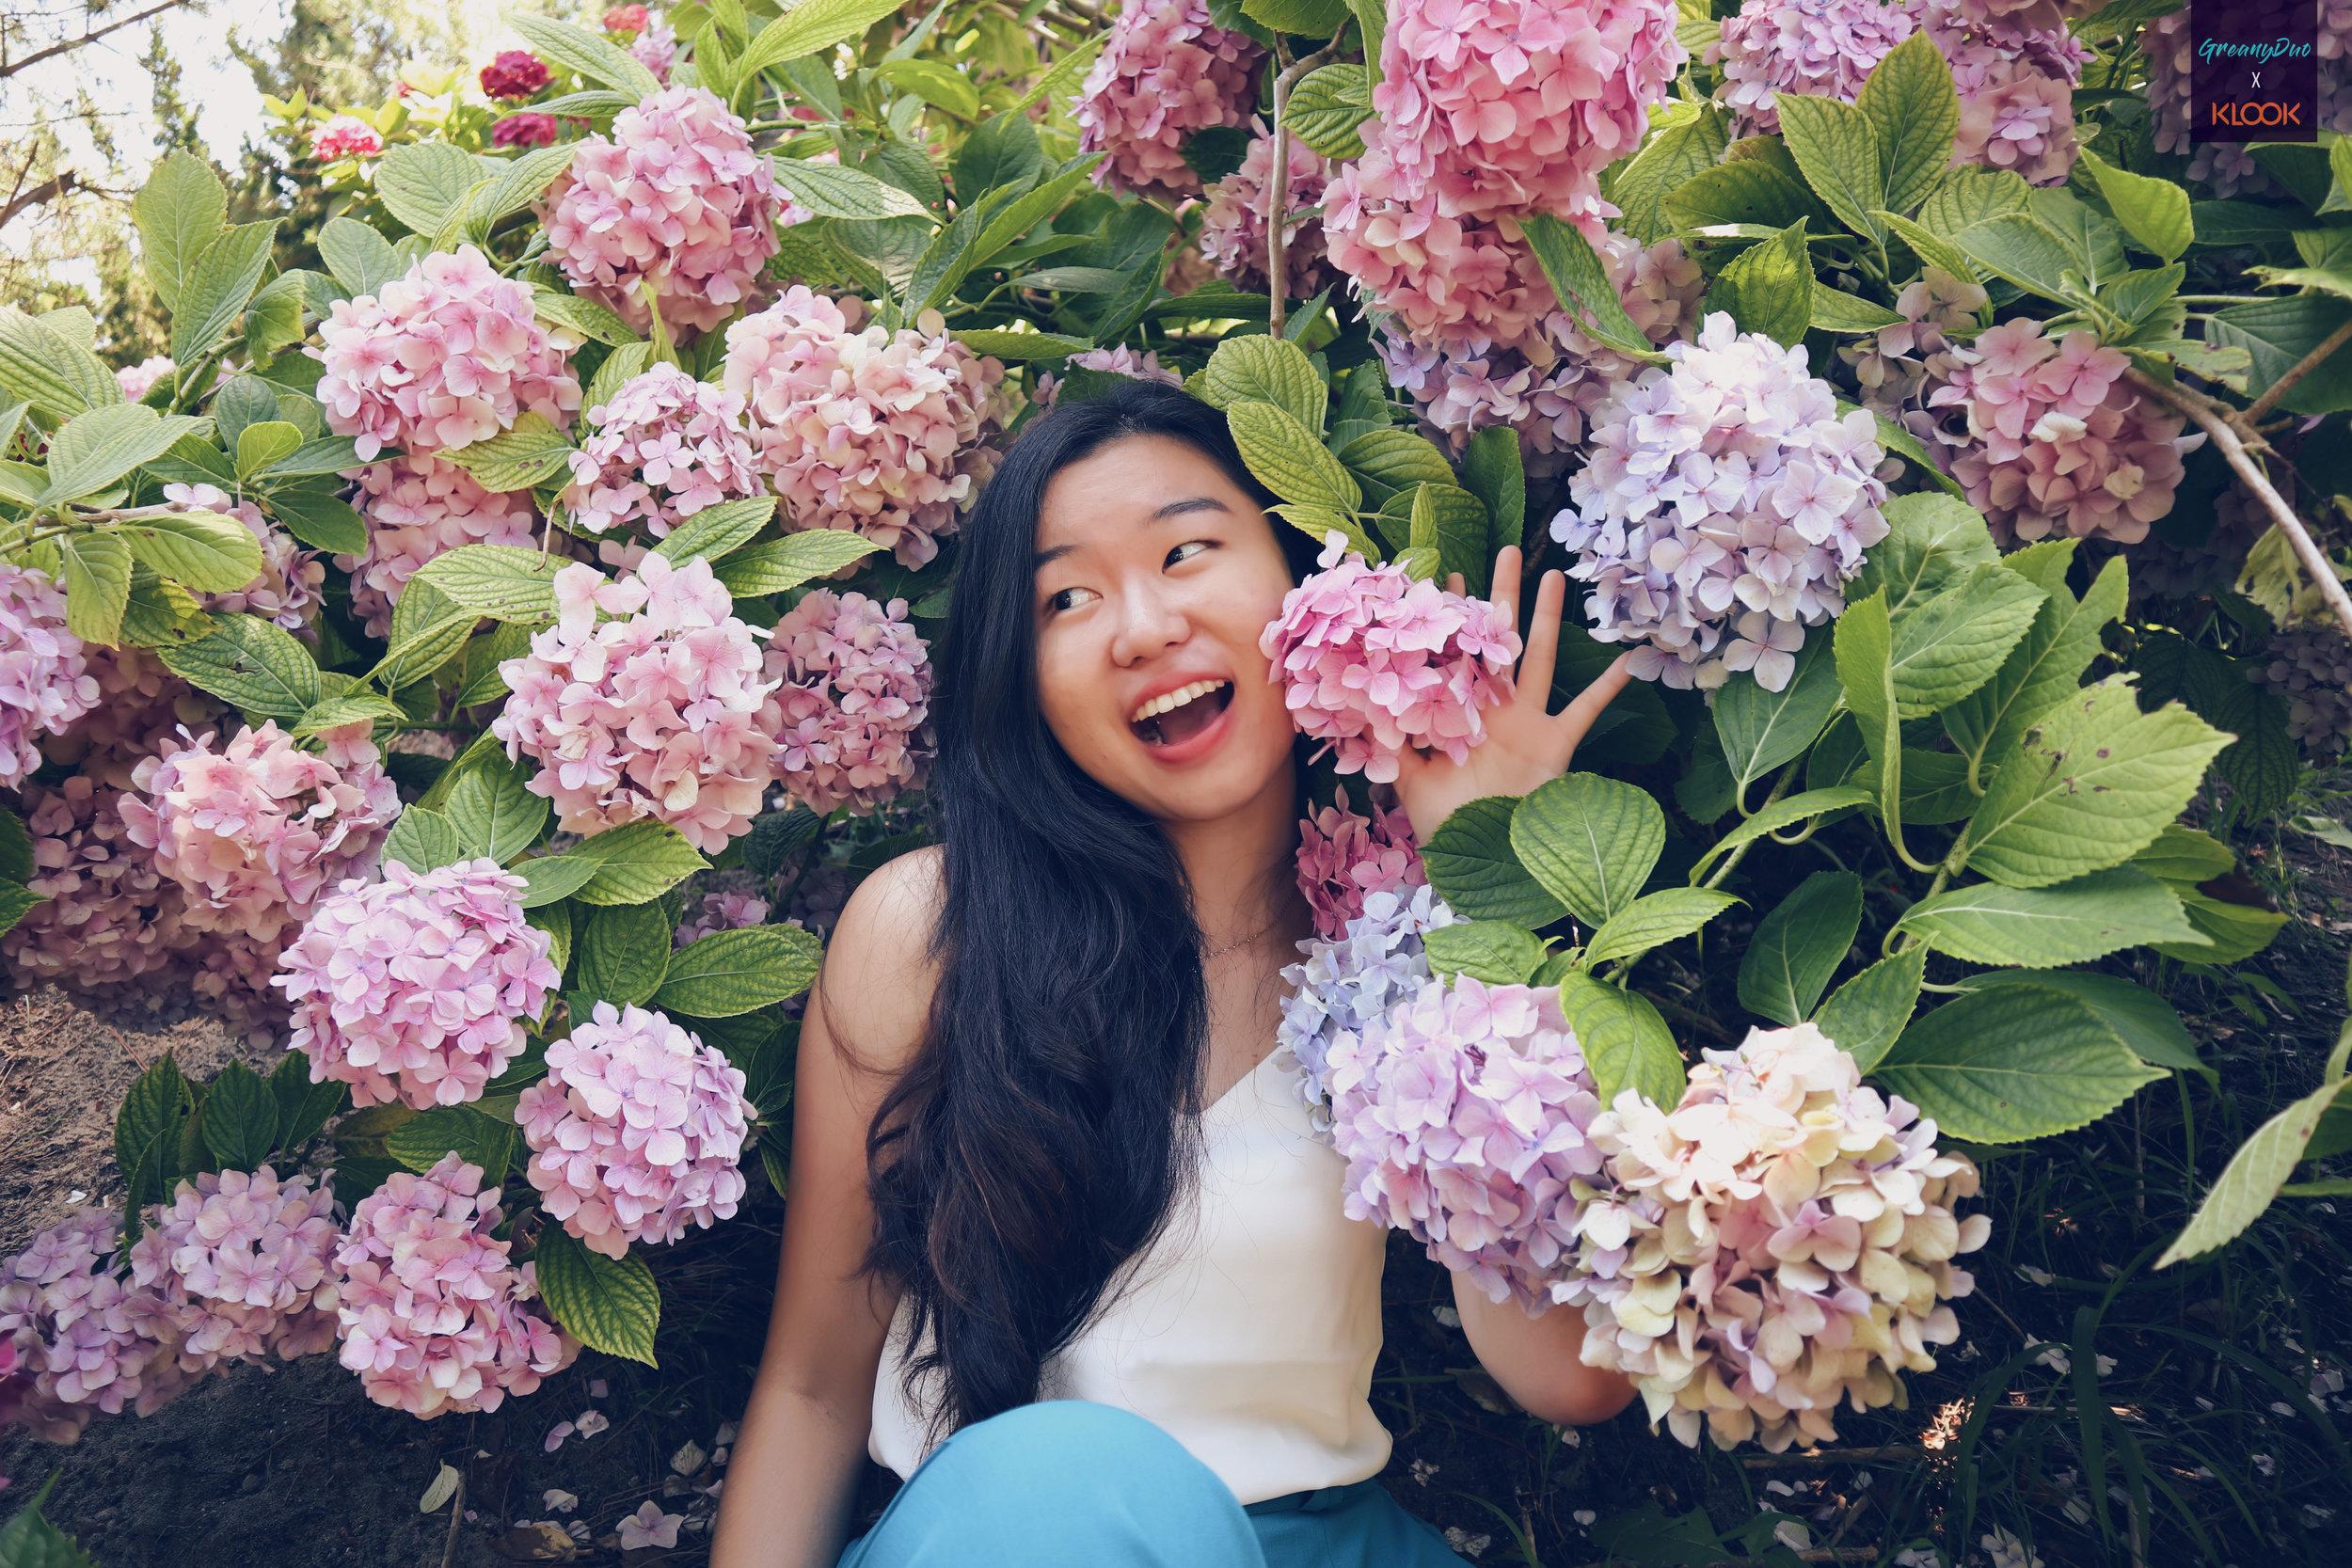 tina posting with hydrangea flower at halliam park, jeju